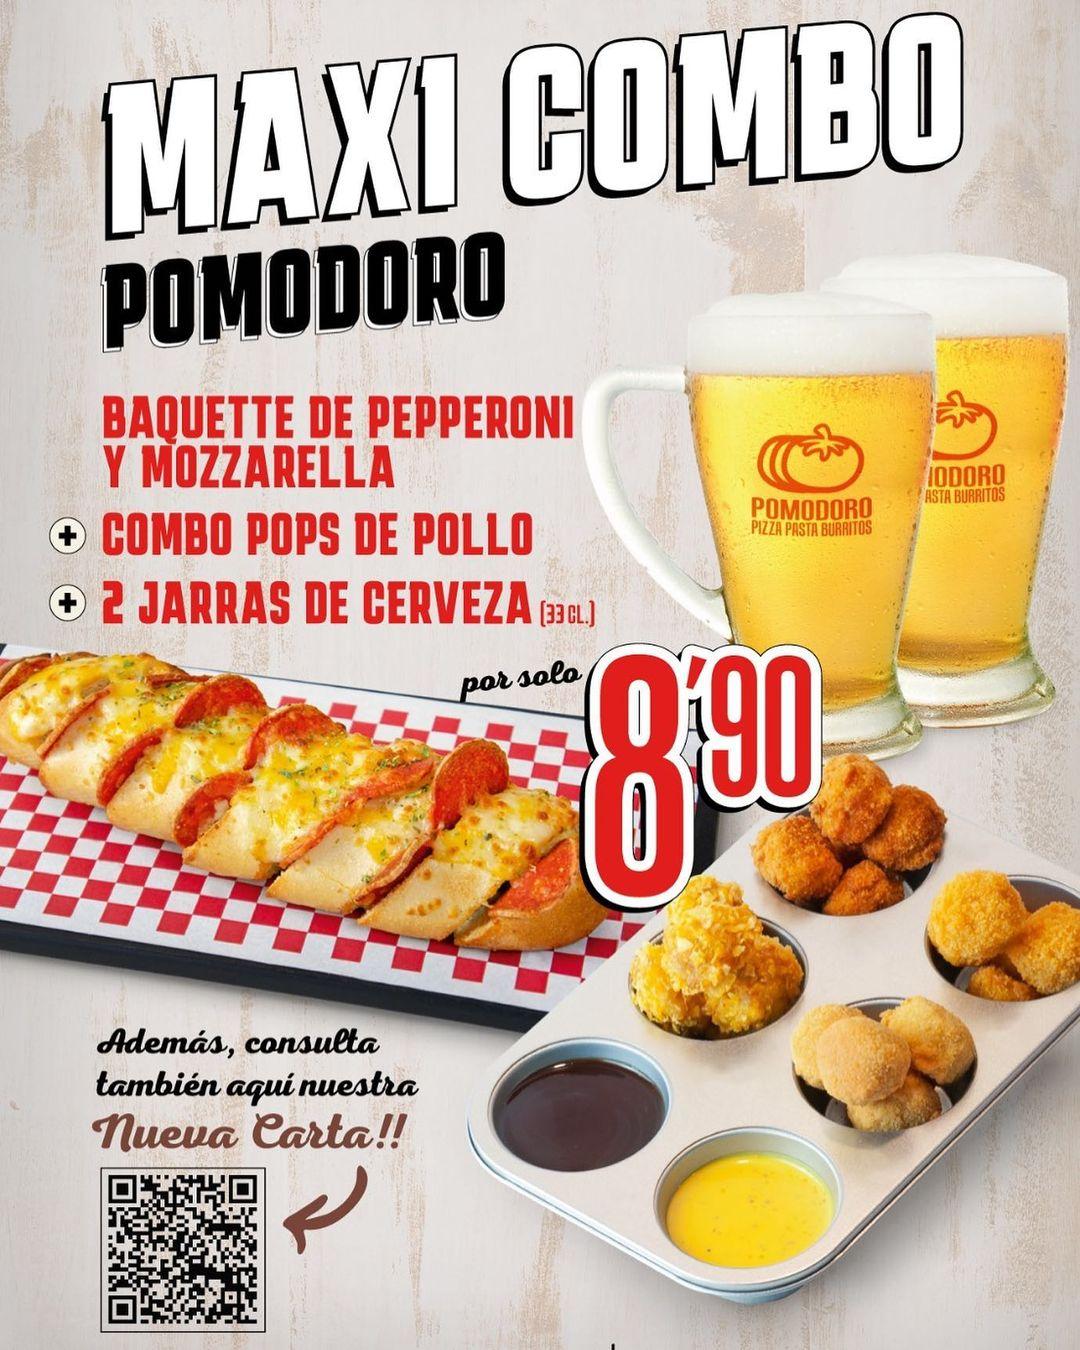 Maxi Combo Promodoro